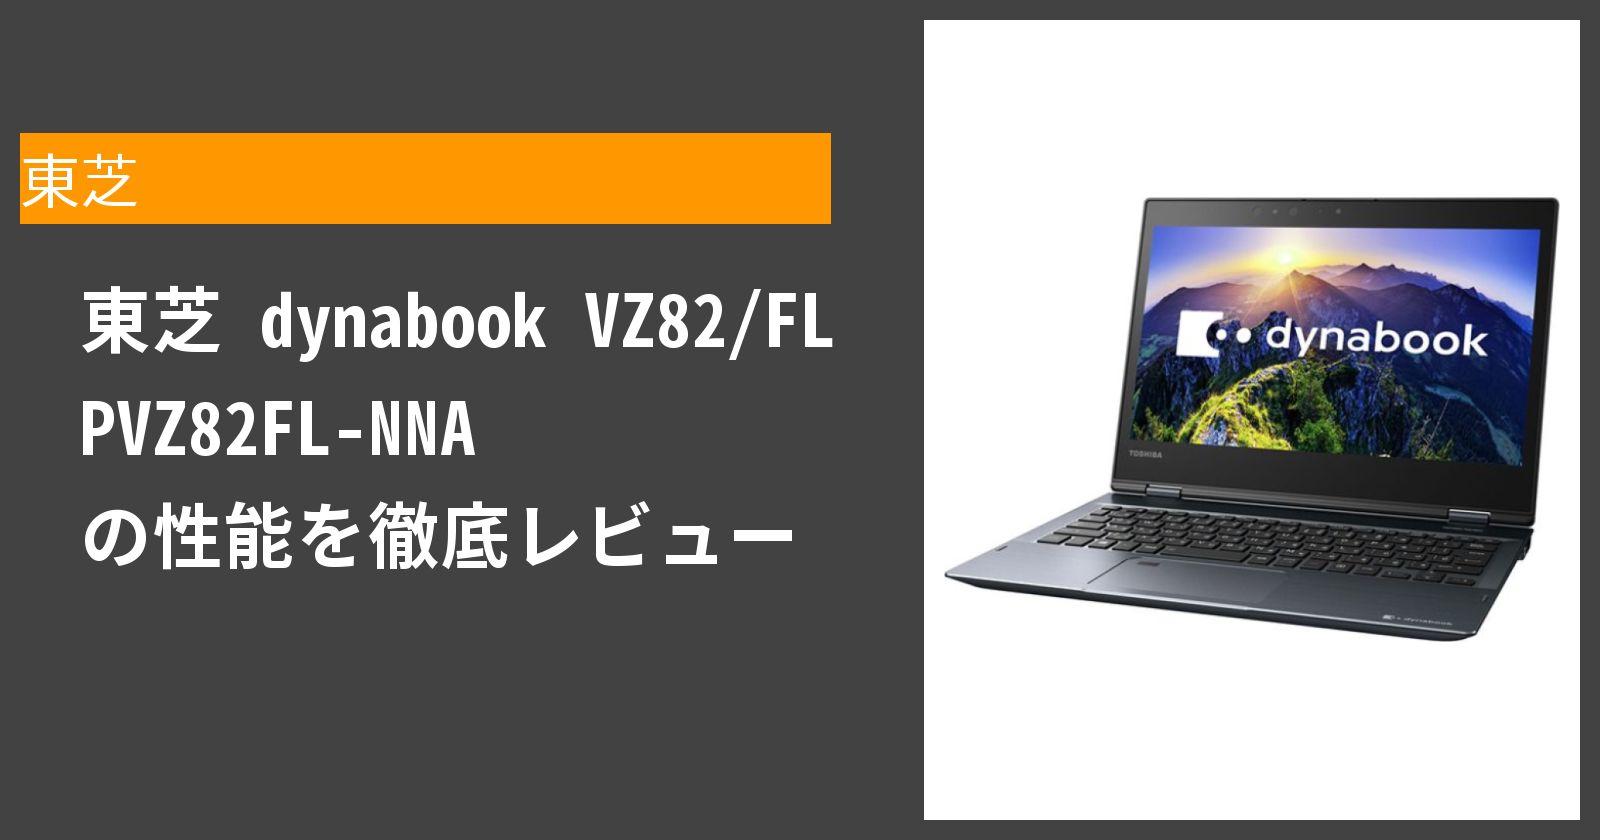 dynabook VZ82/FL の性能を徹底レビュー